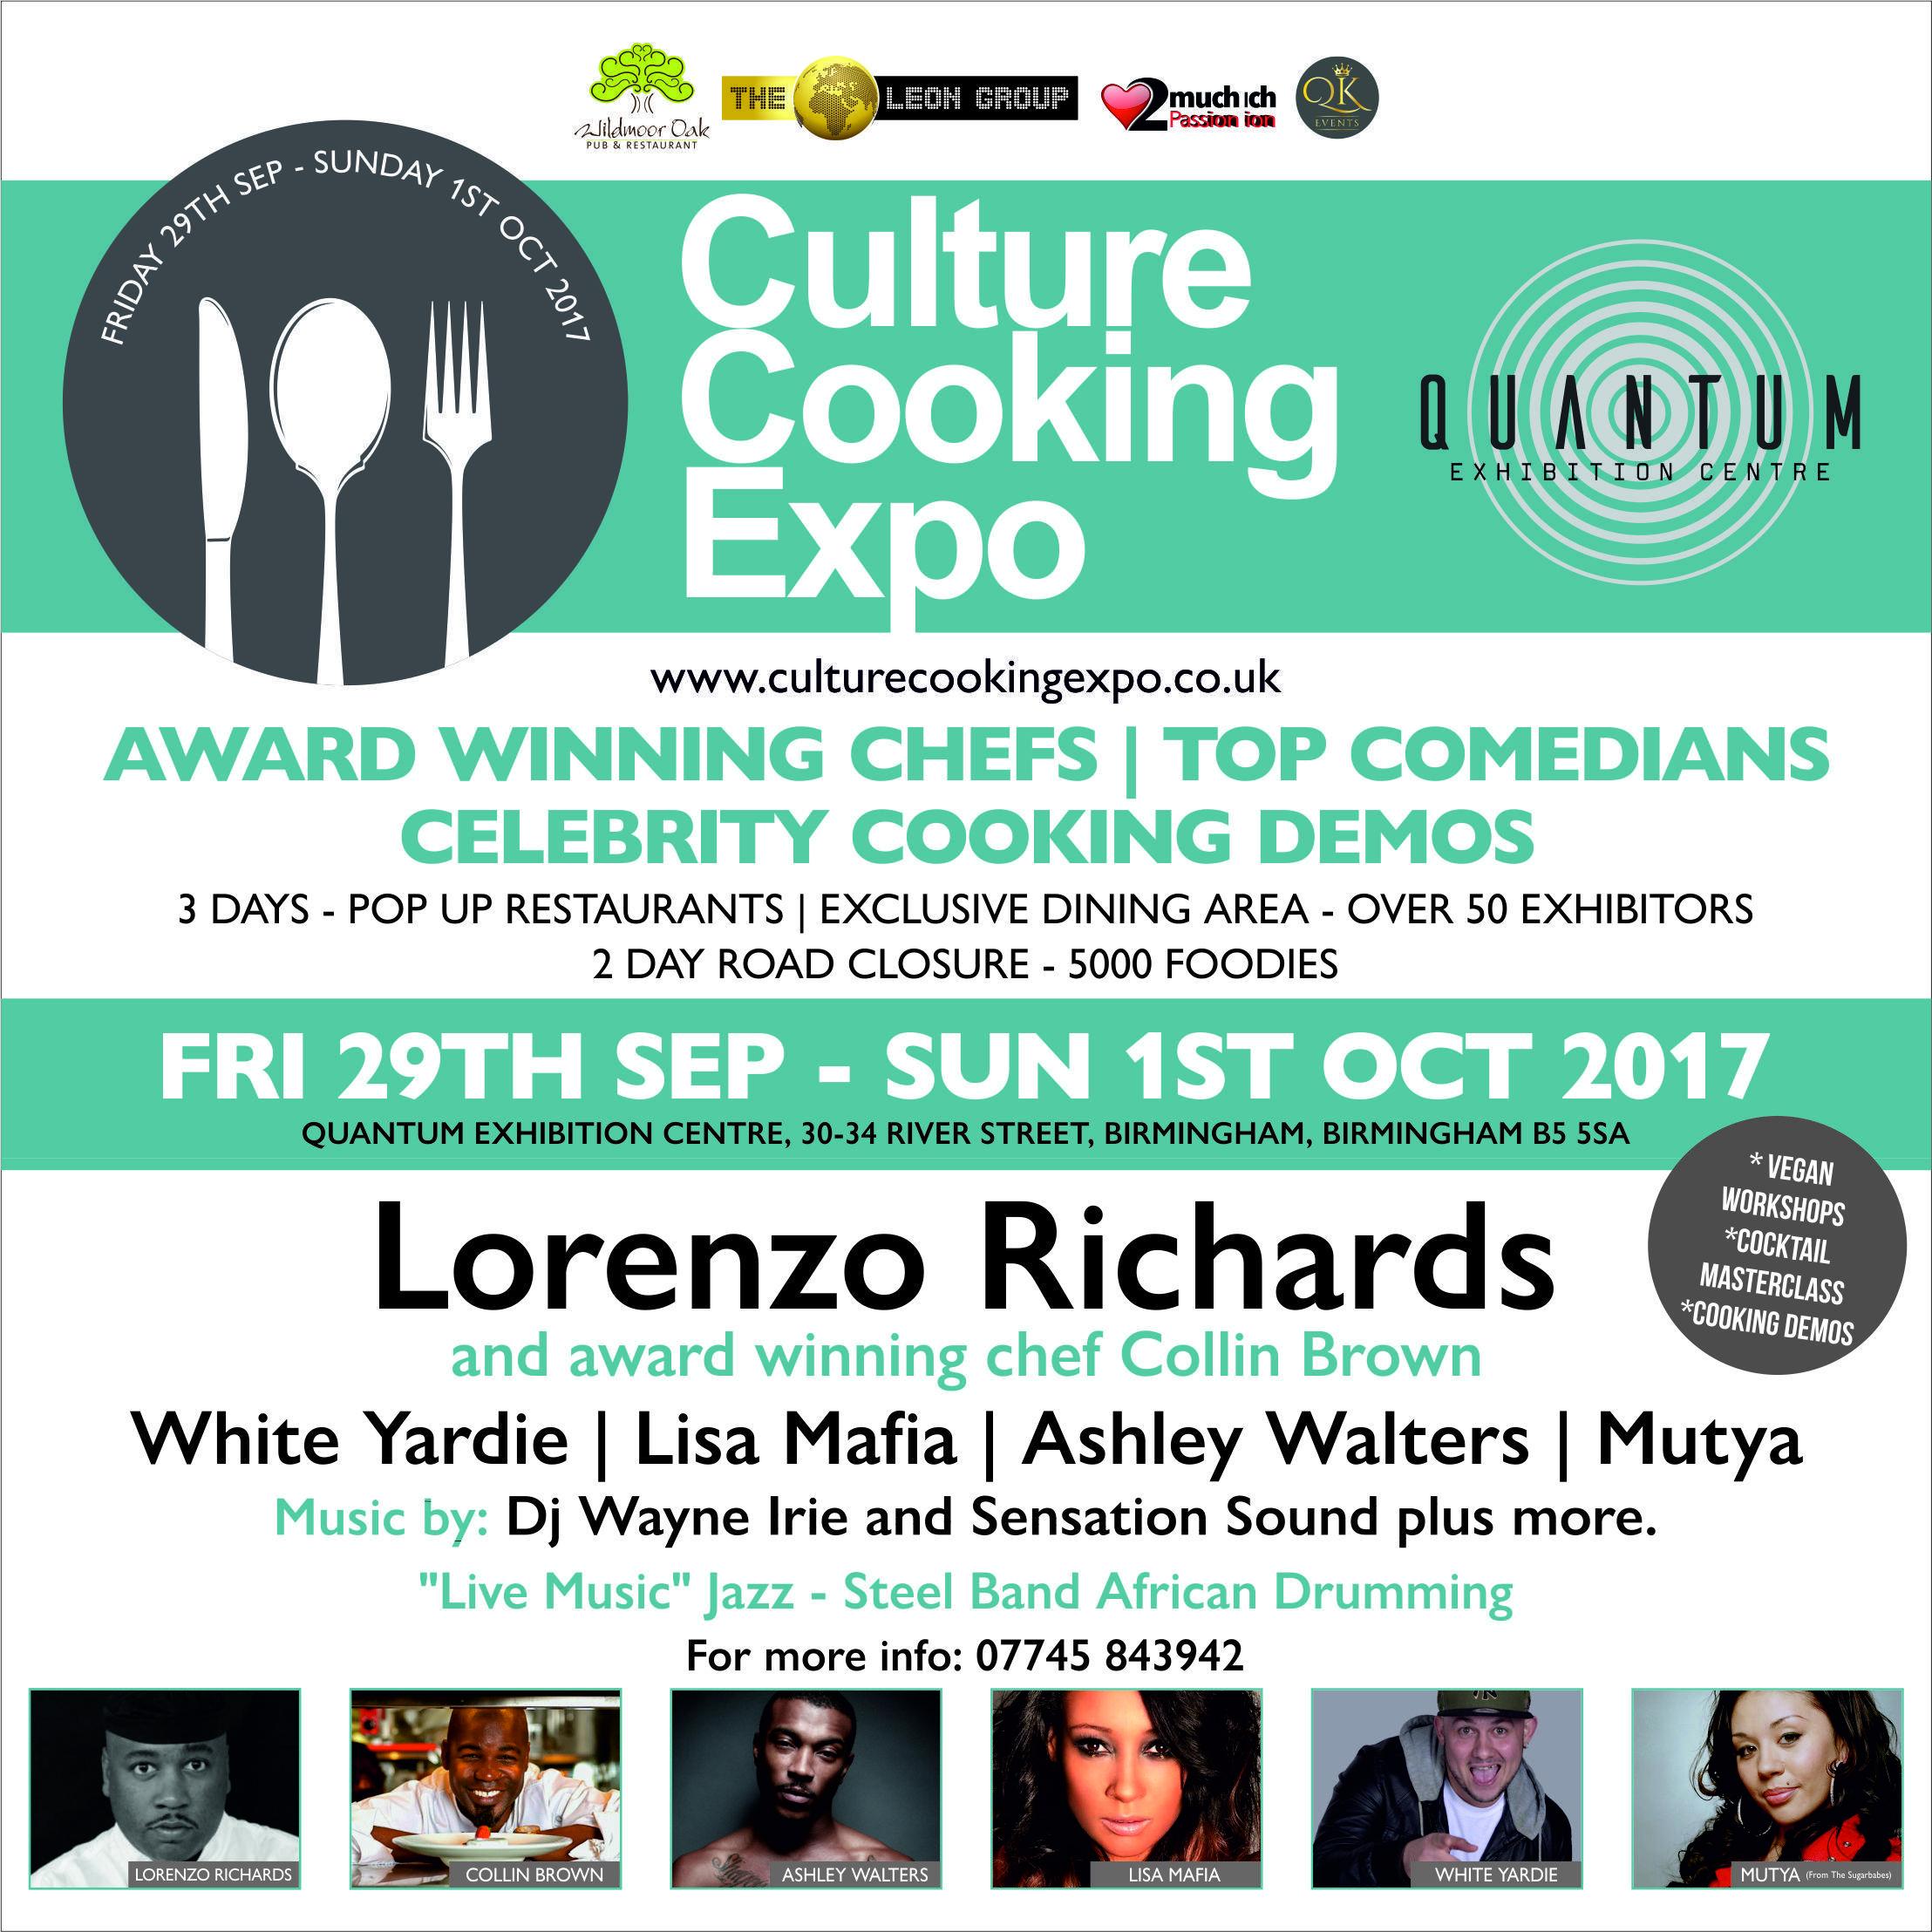 CULTURE COOKING EXPO | Blacknet UK